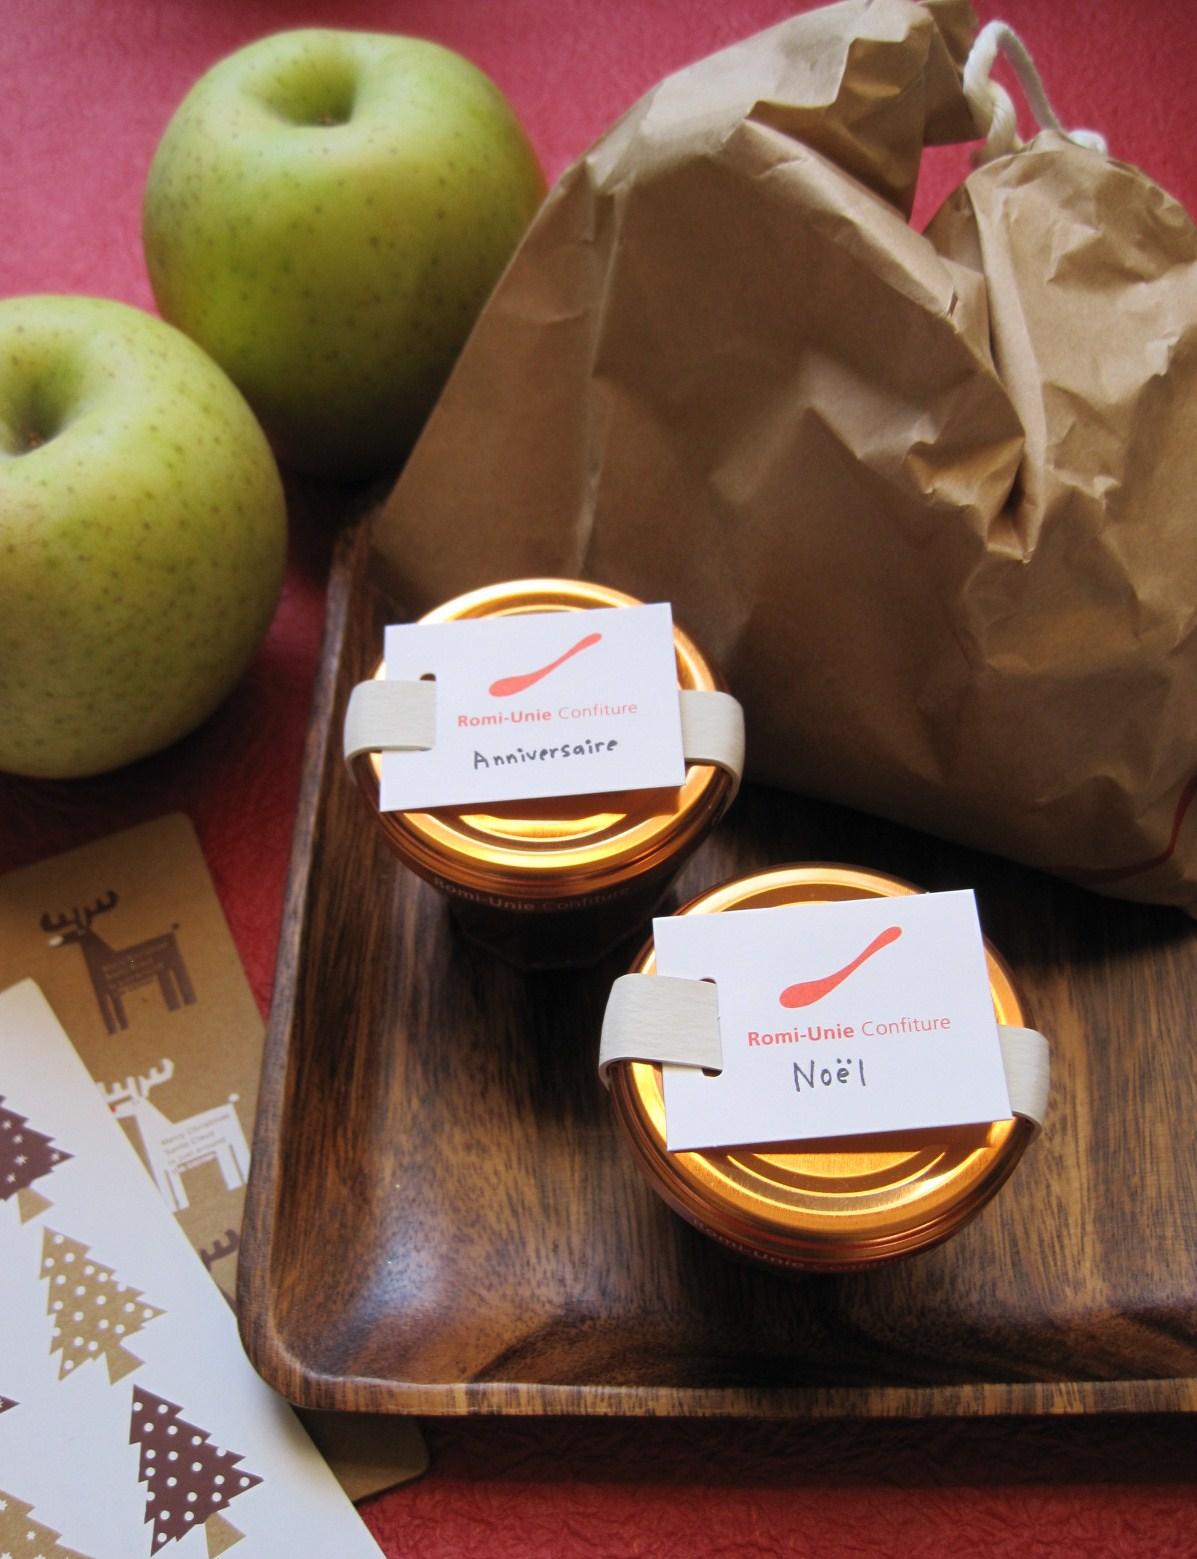 Romi-Unie の美味しいジャムと 信州のリンゴ♪_f0236260_114475.jpg